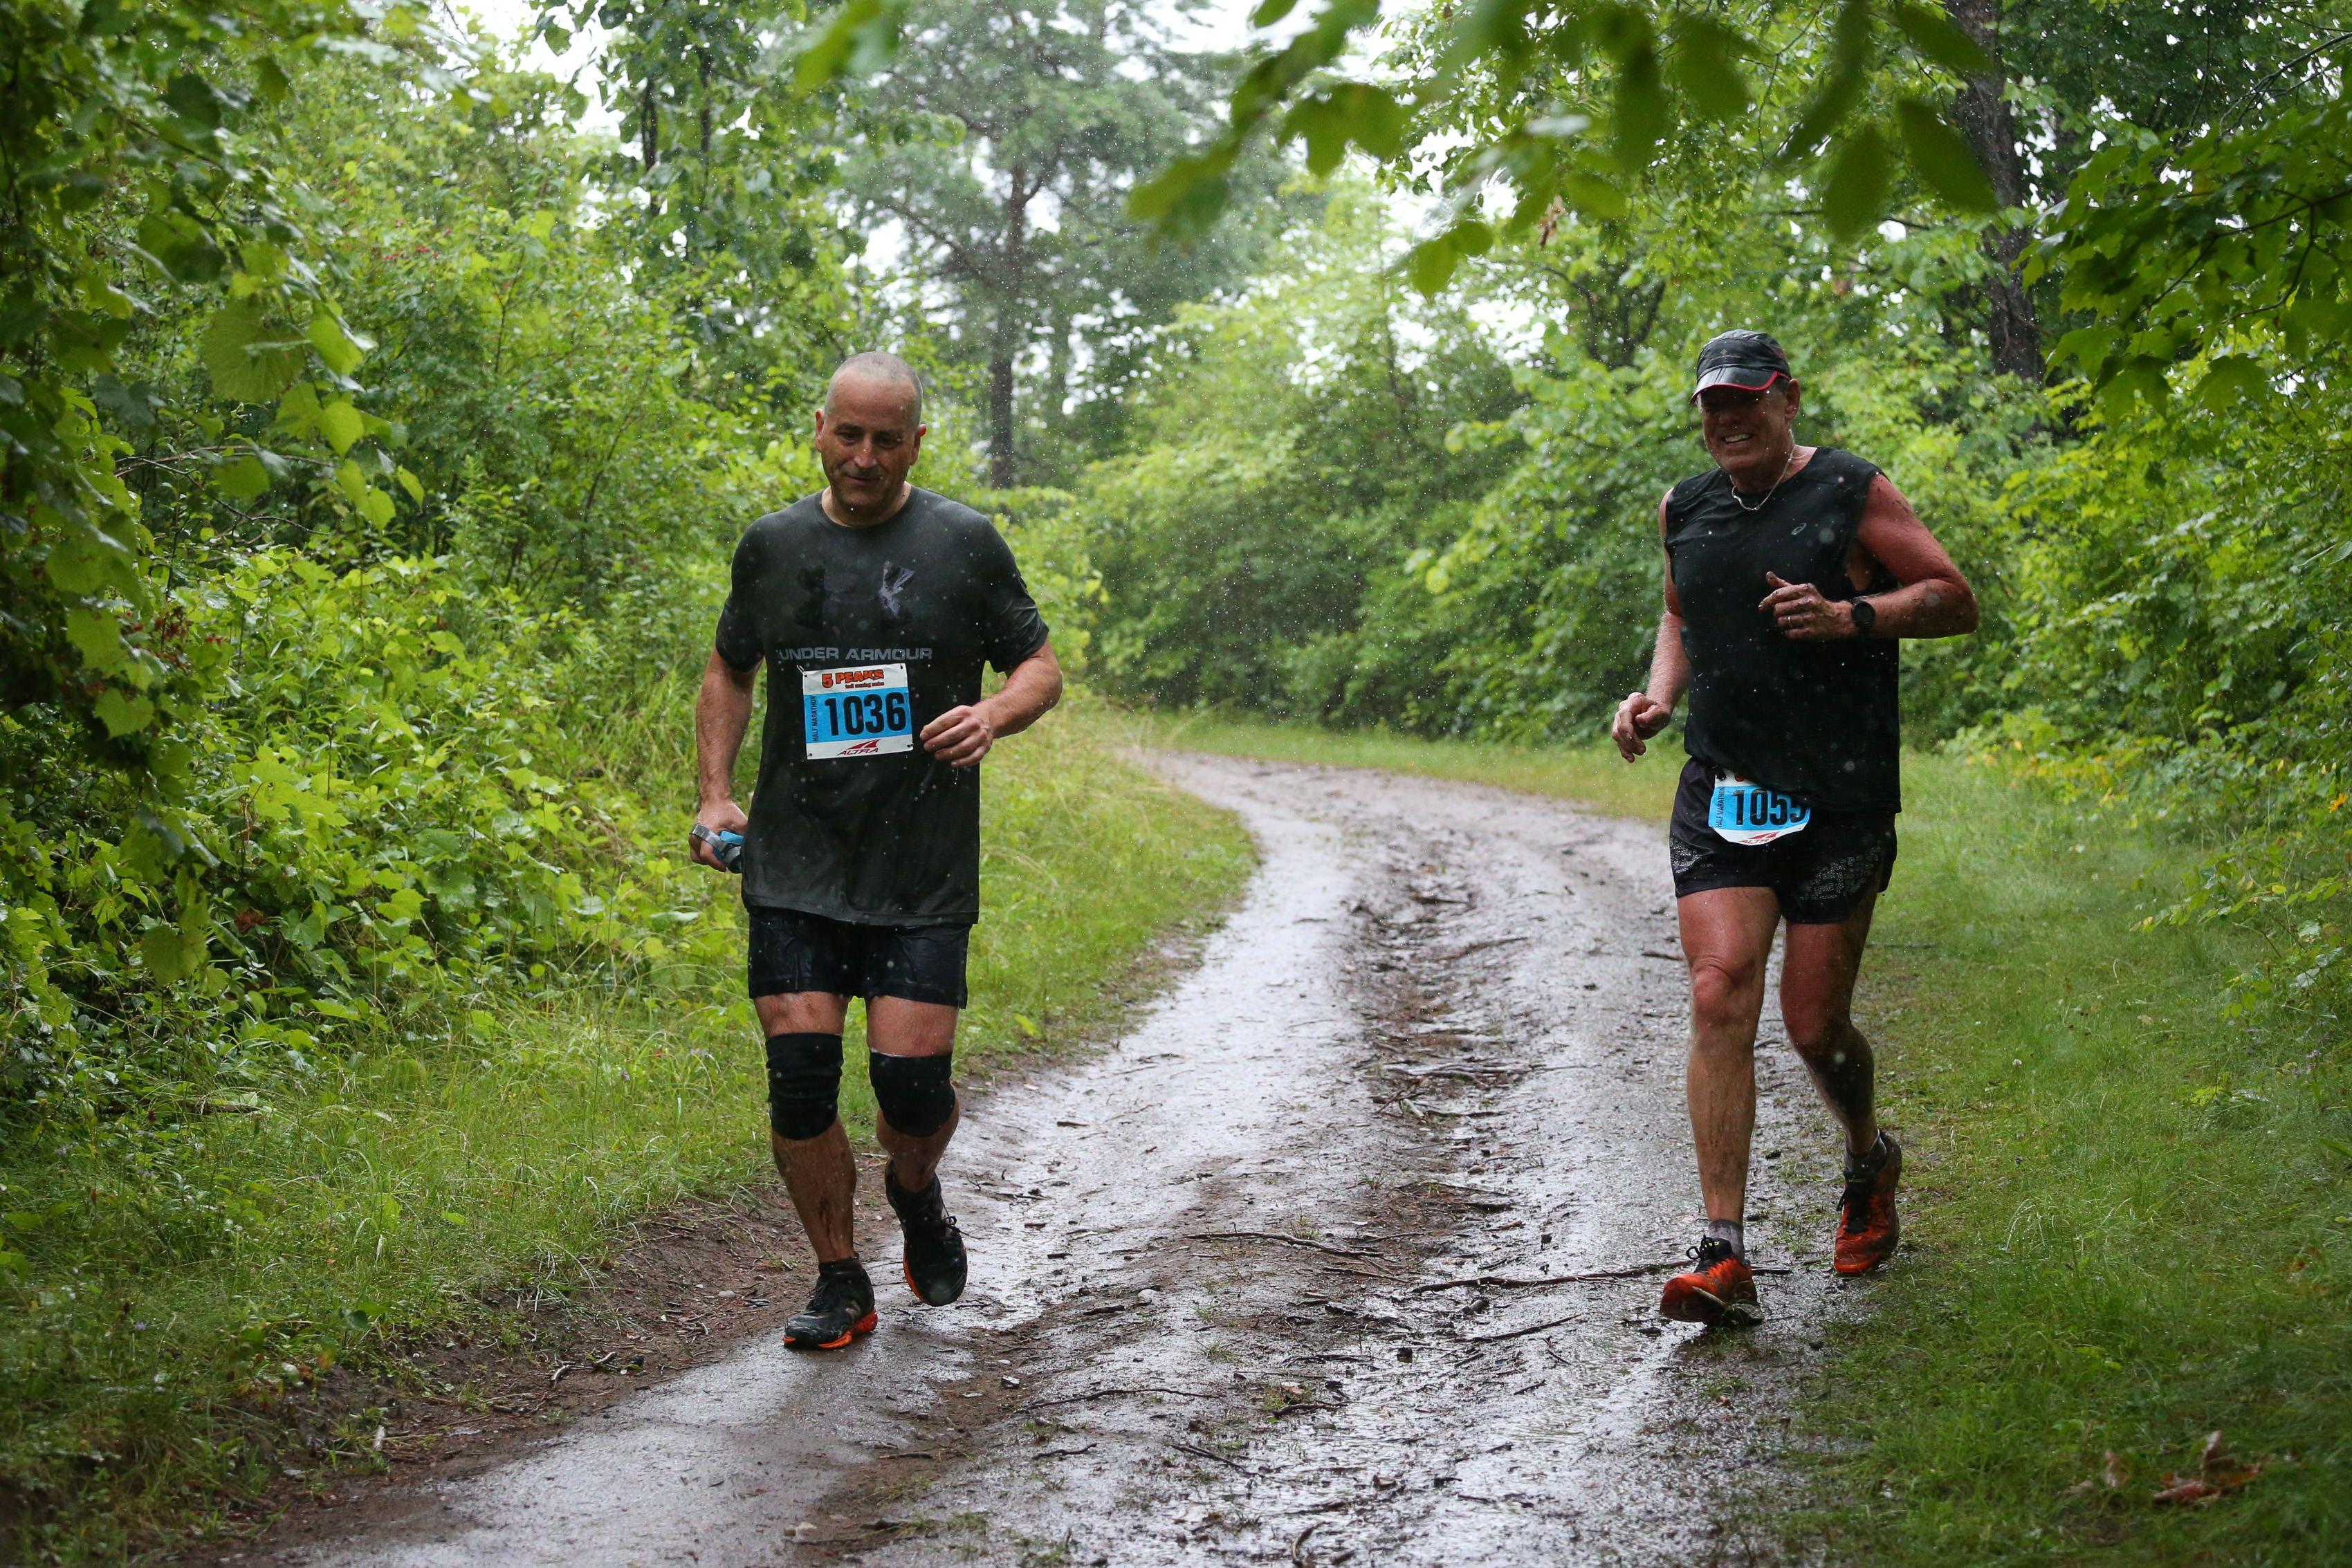 Pin van Drift King op Marathons Sportkleding